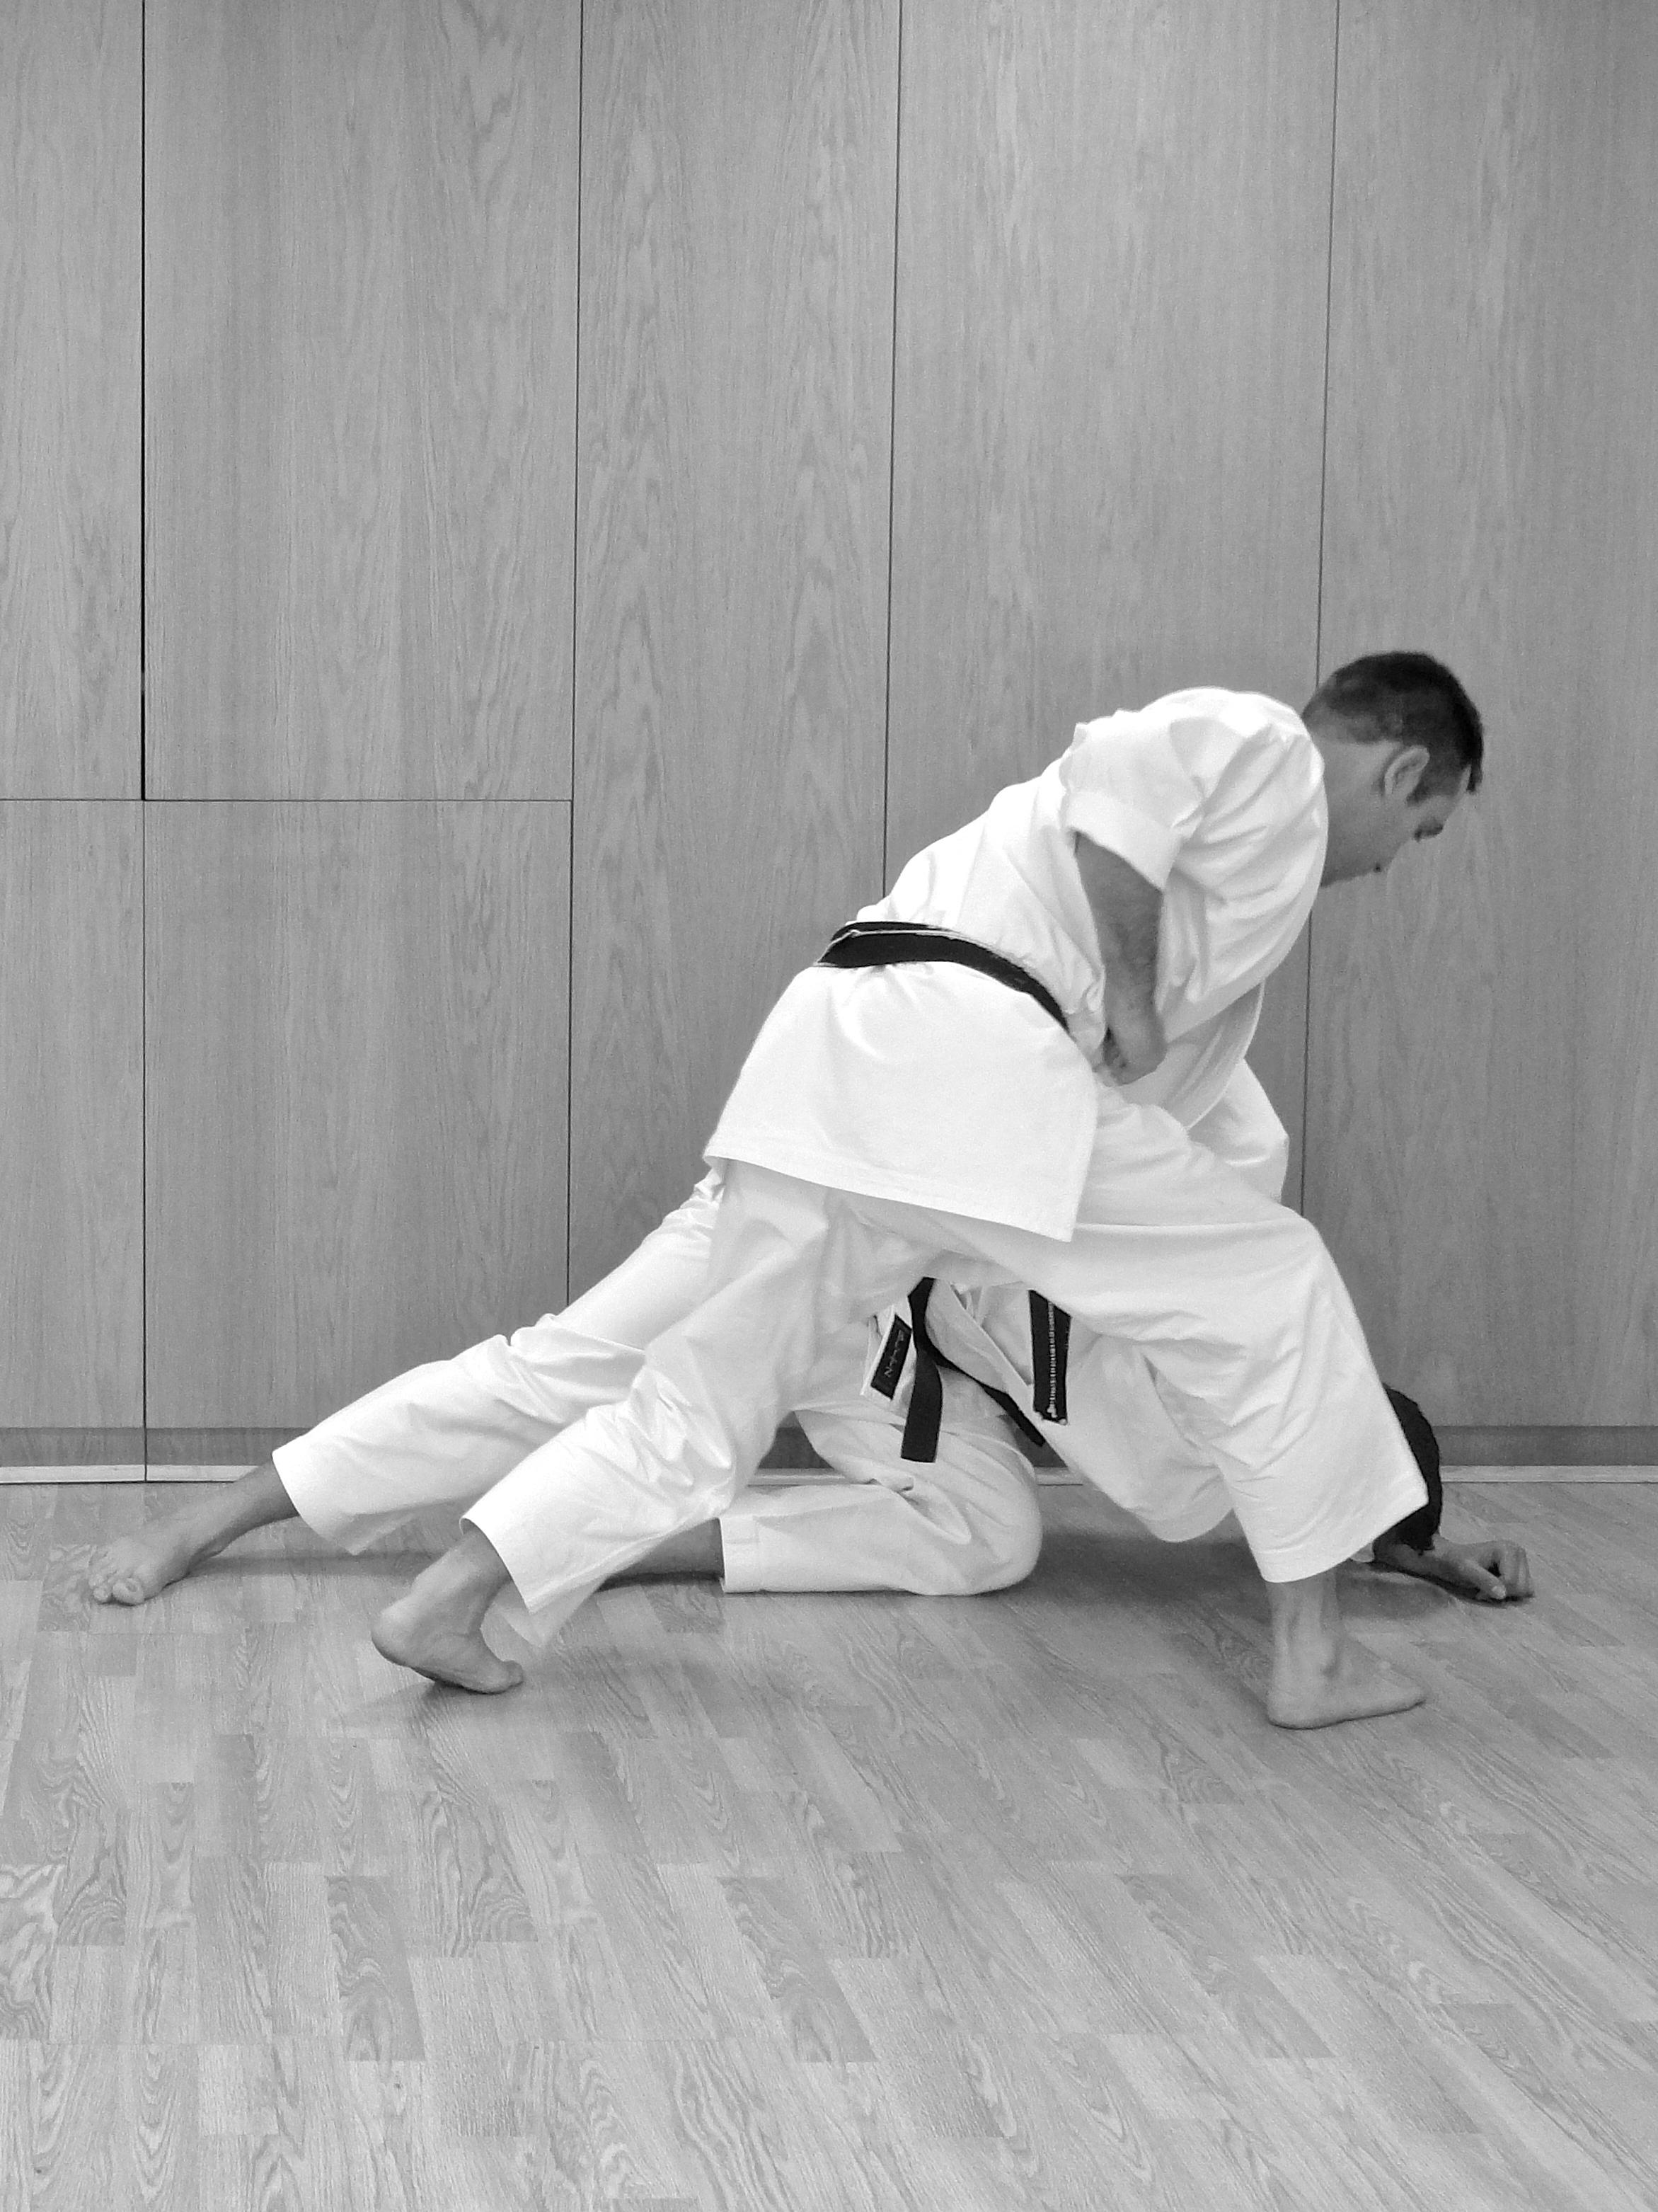 John Titchen Karate session